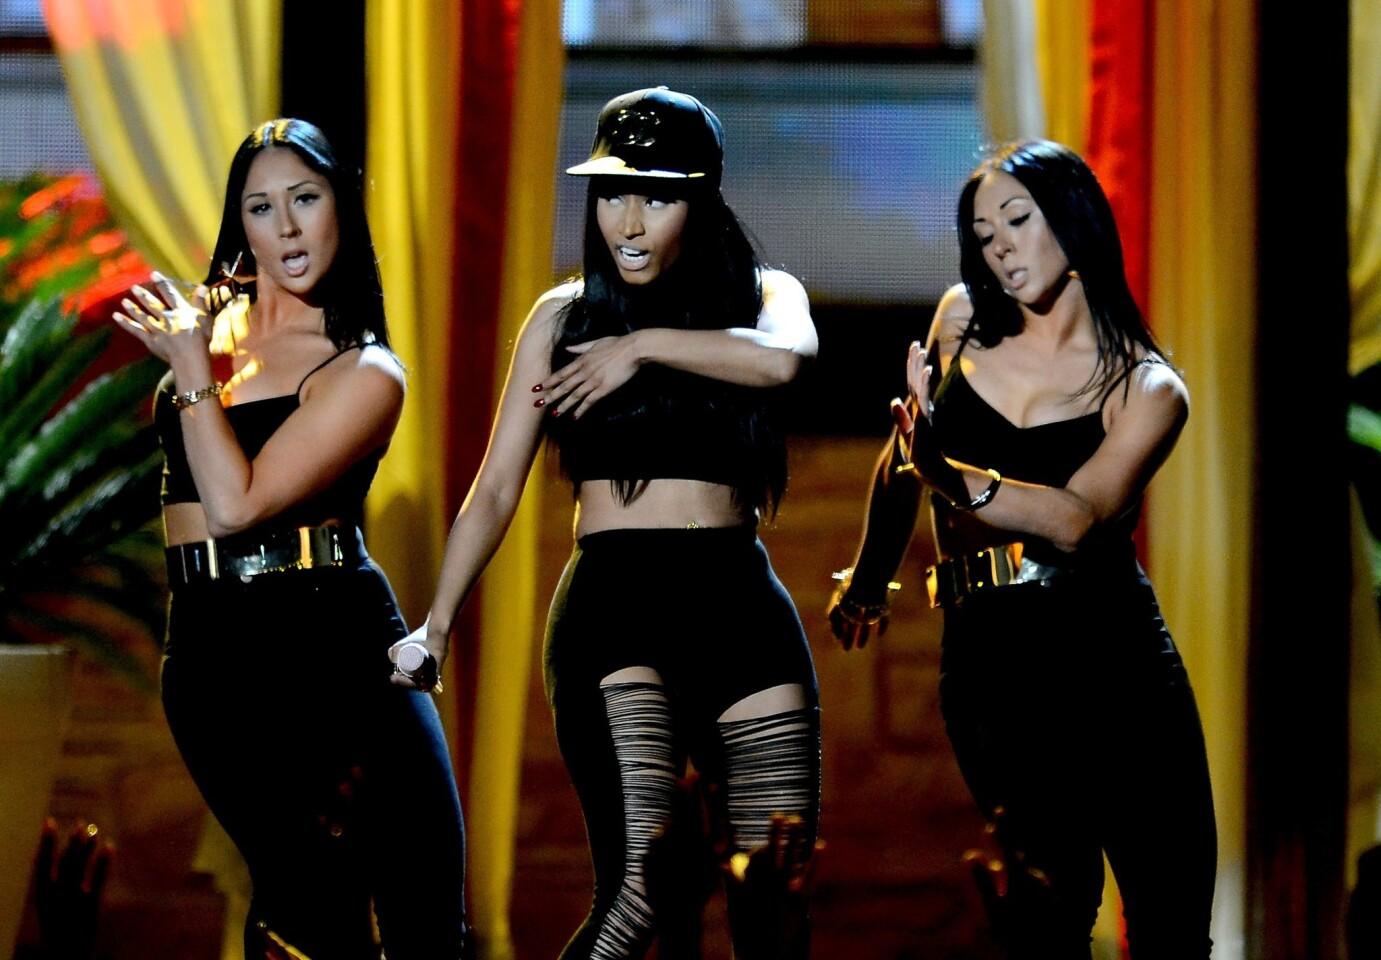 Nicki Minaj, center, performs onstage during the 2013 Billboard Music Awards.